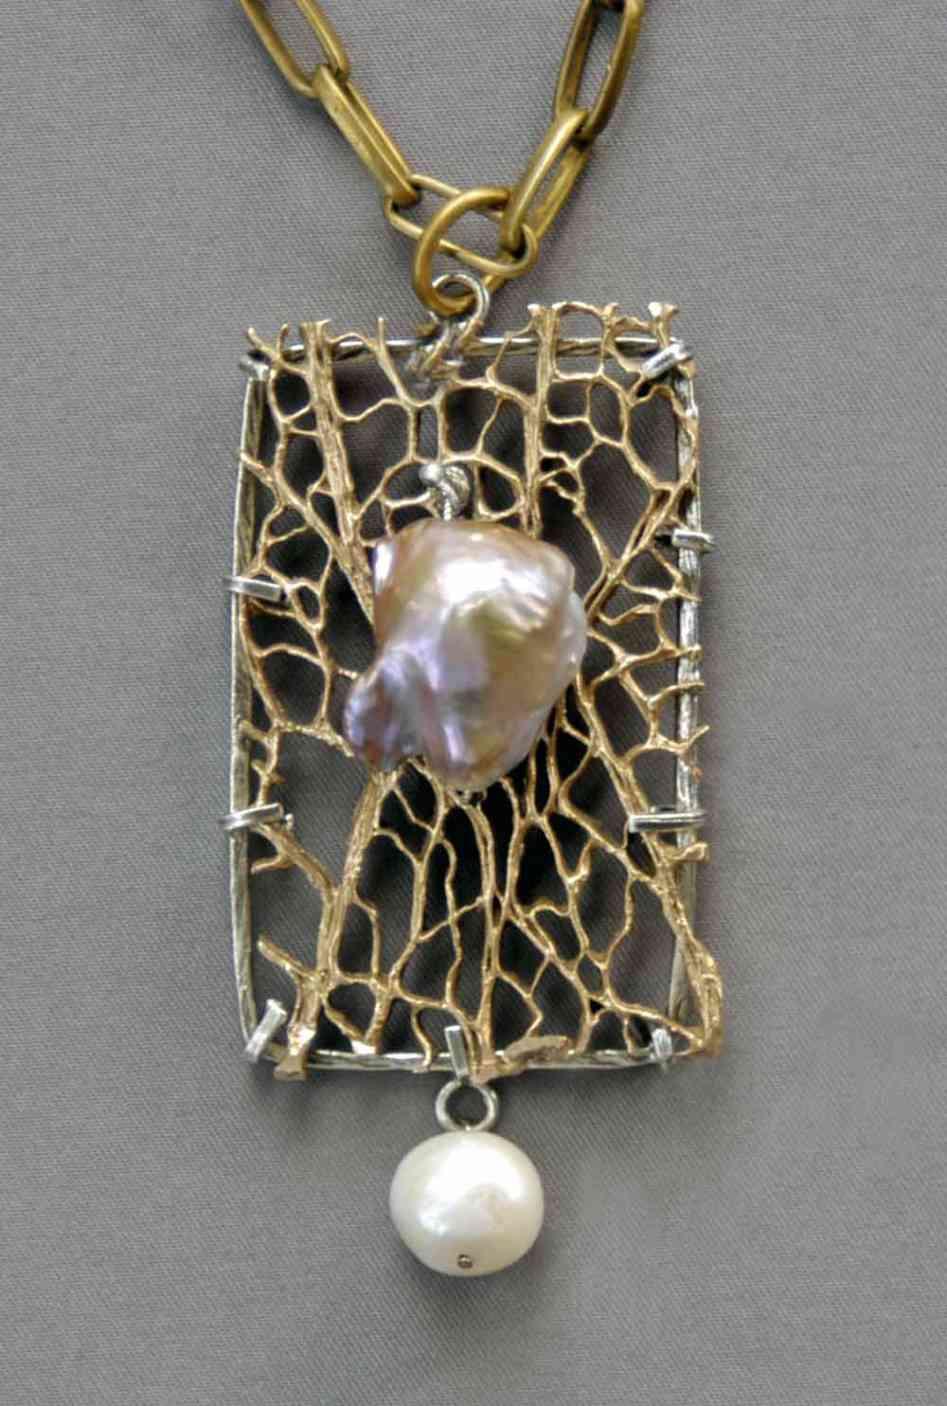 Pearl on a Web of Bronze by Mirinda Kossoff